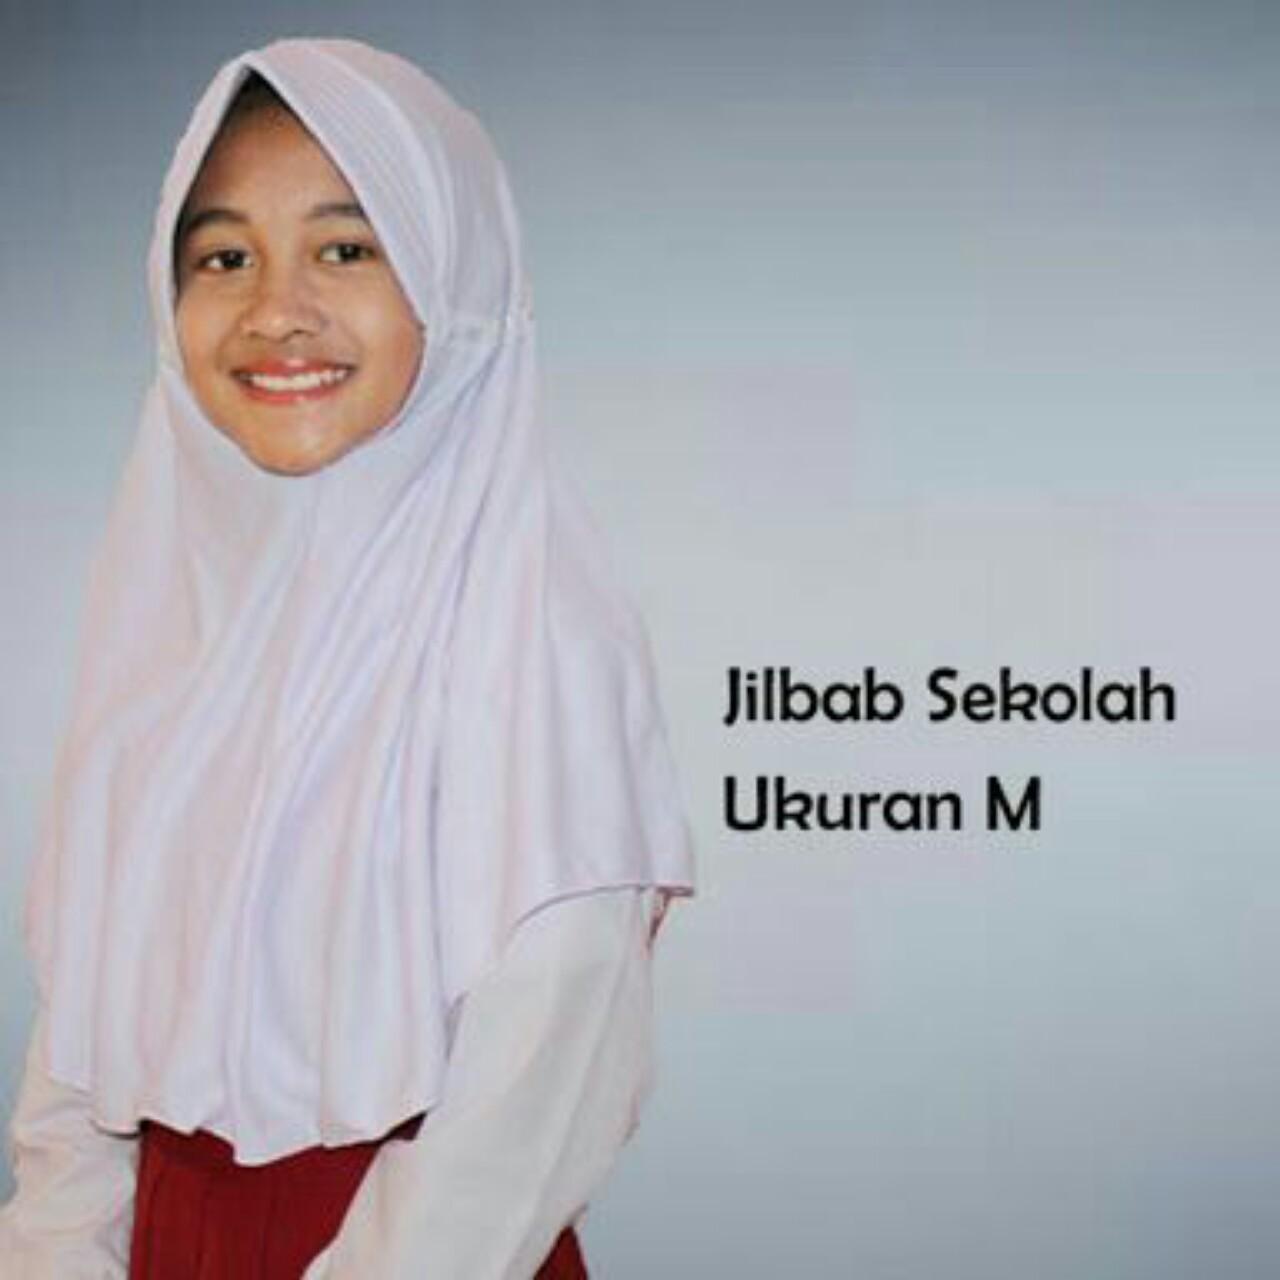 Jilbab anak sekolah ukuran M